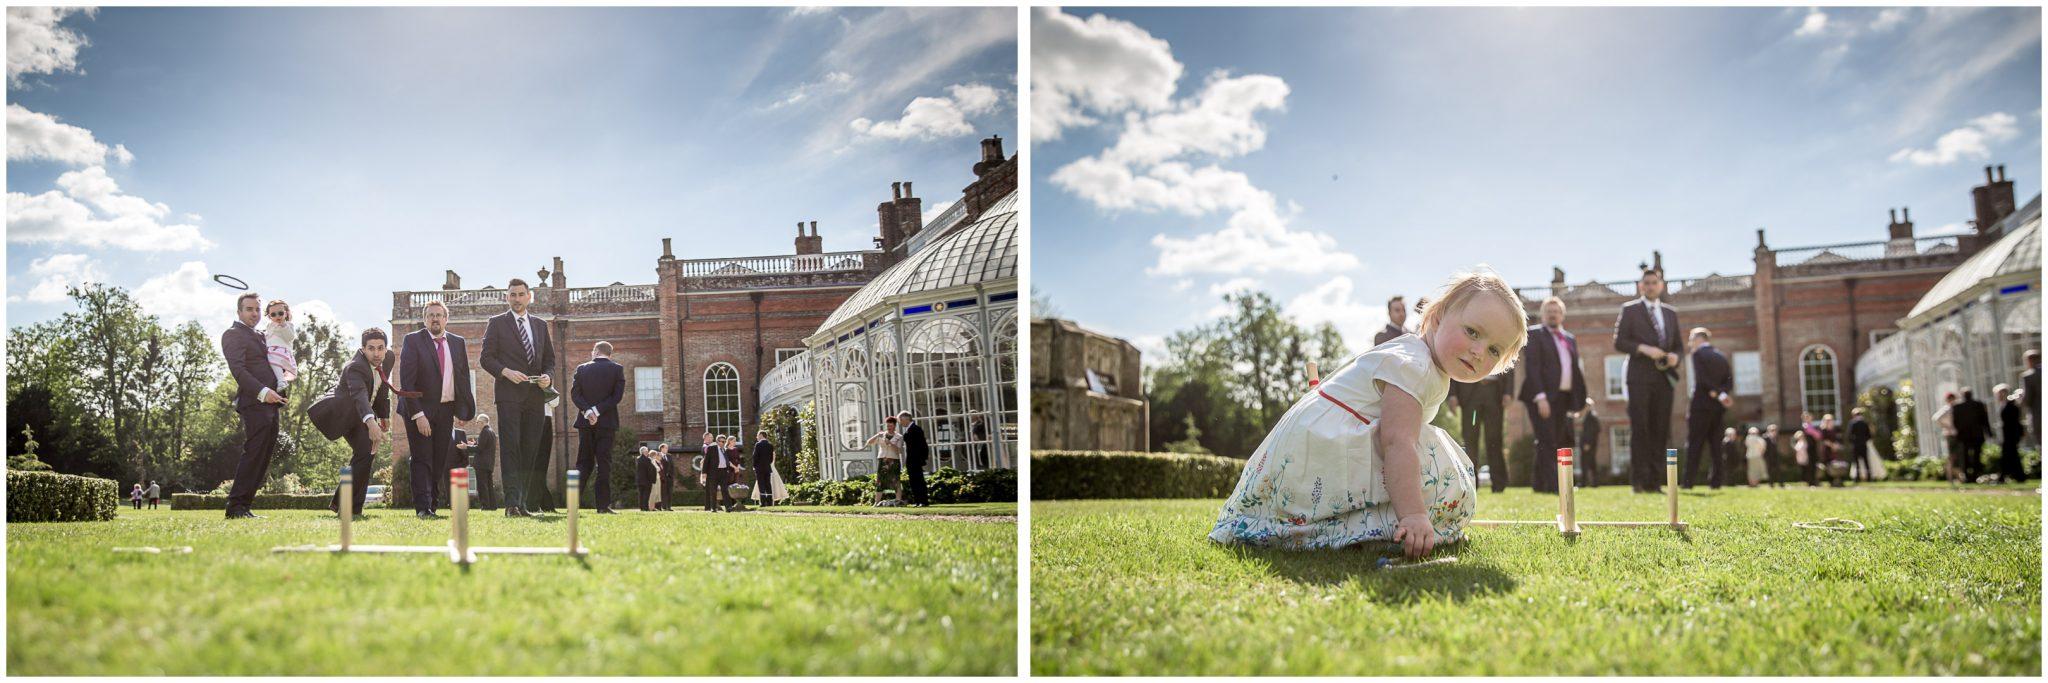 Avington Park wedding photography guests playing garden games